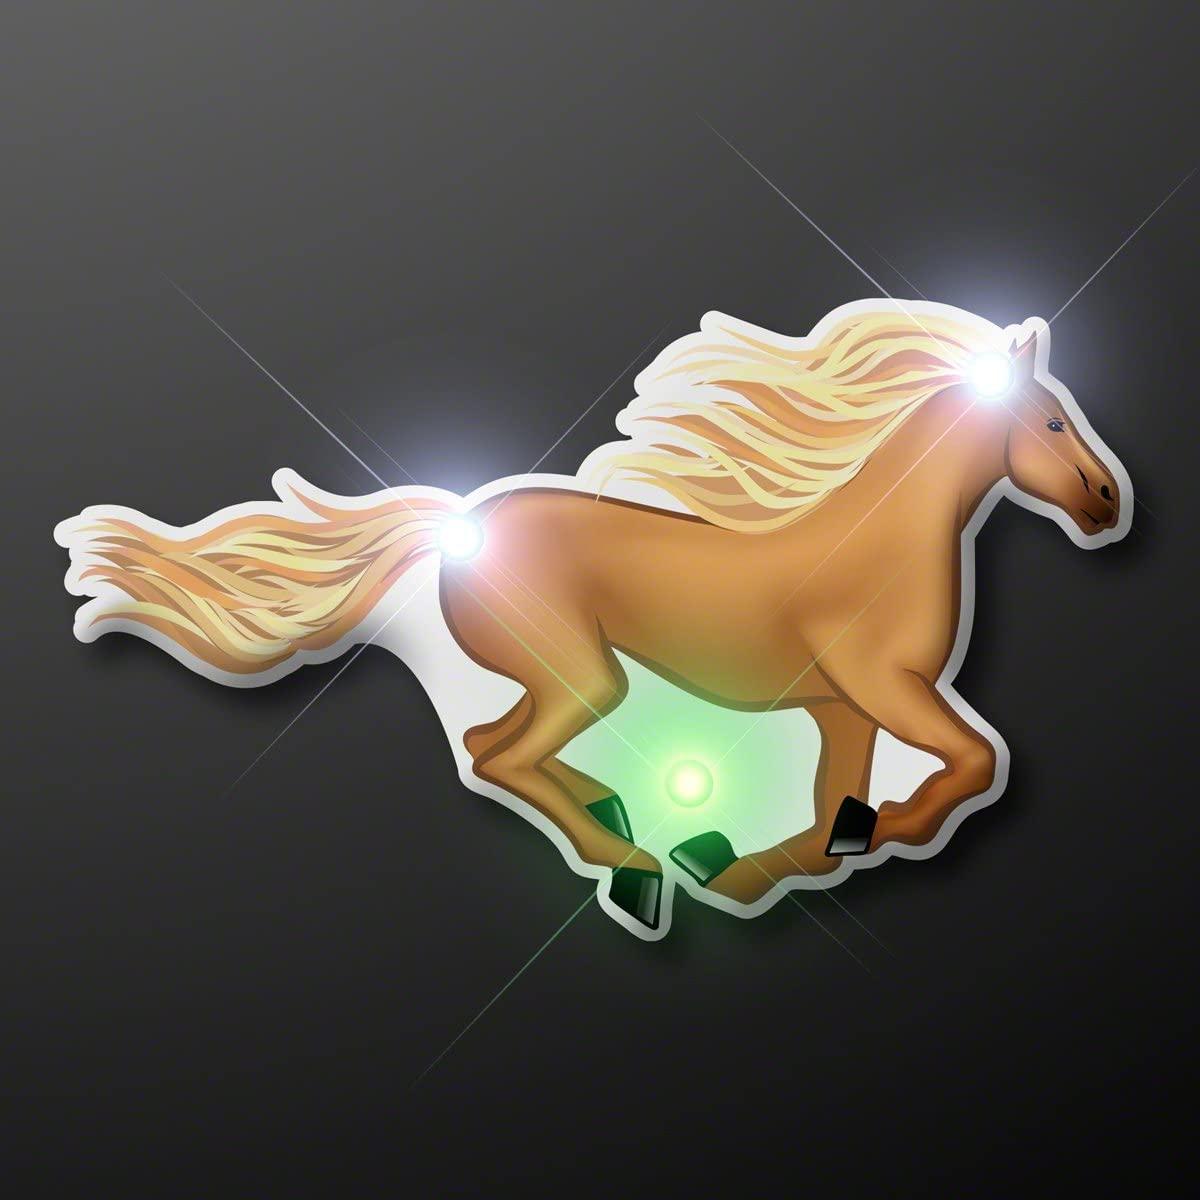 Light Up Horse Flashing Blinking LED Body Light Lapel Pin (5-Pack)